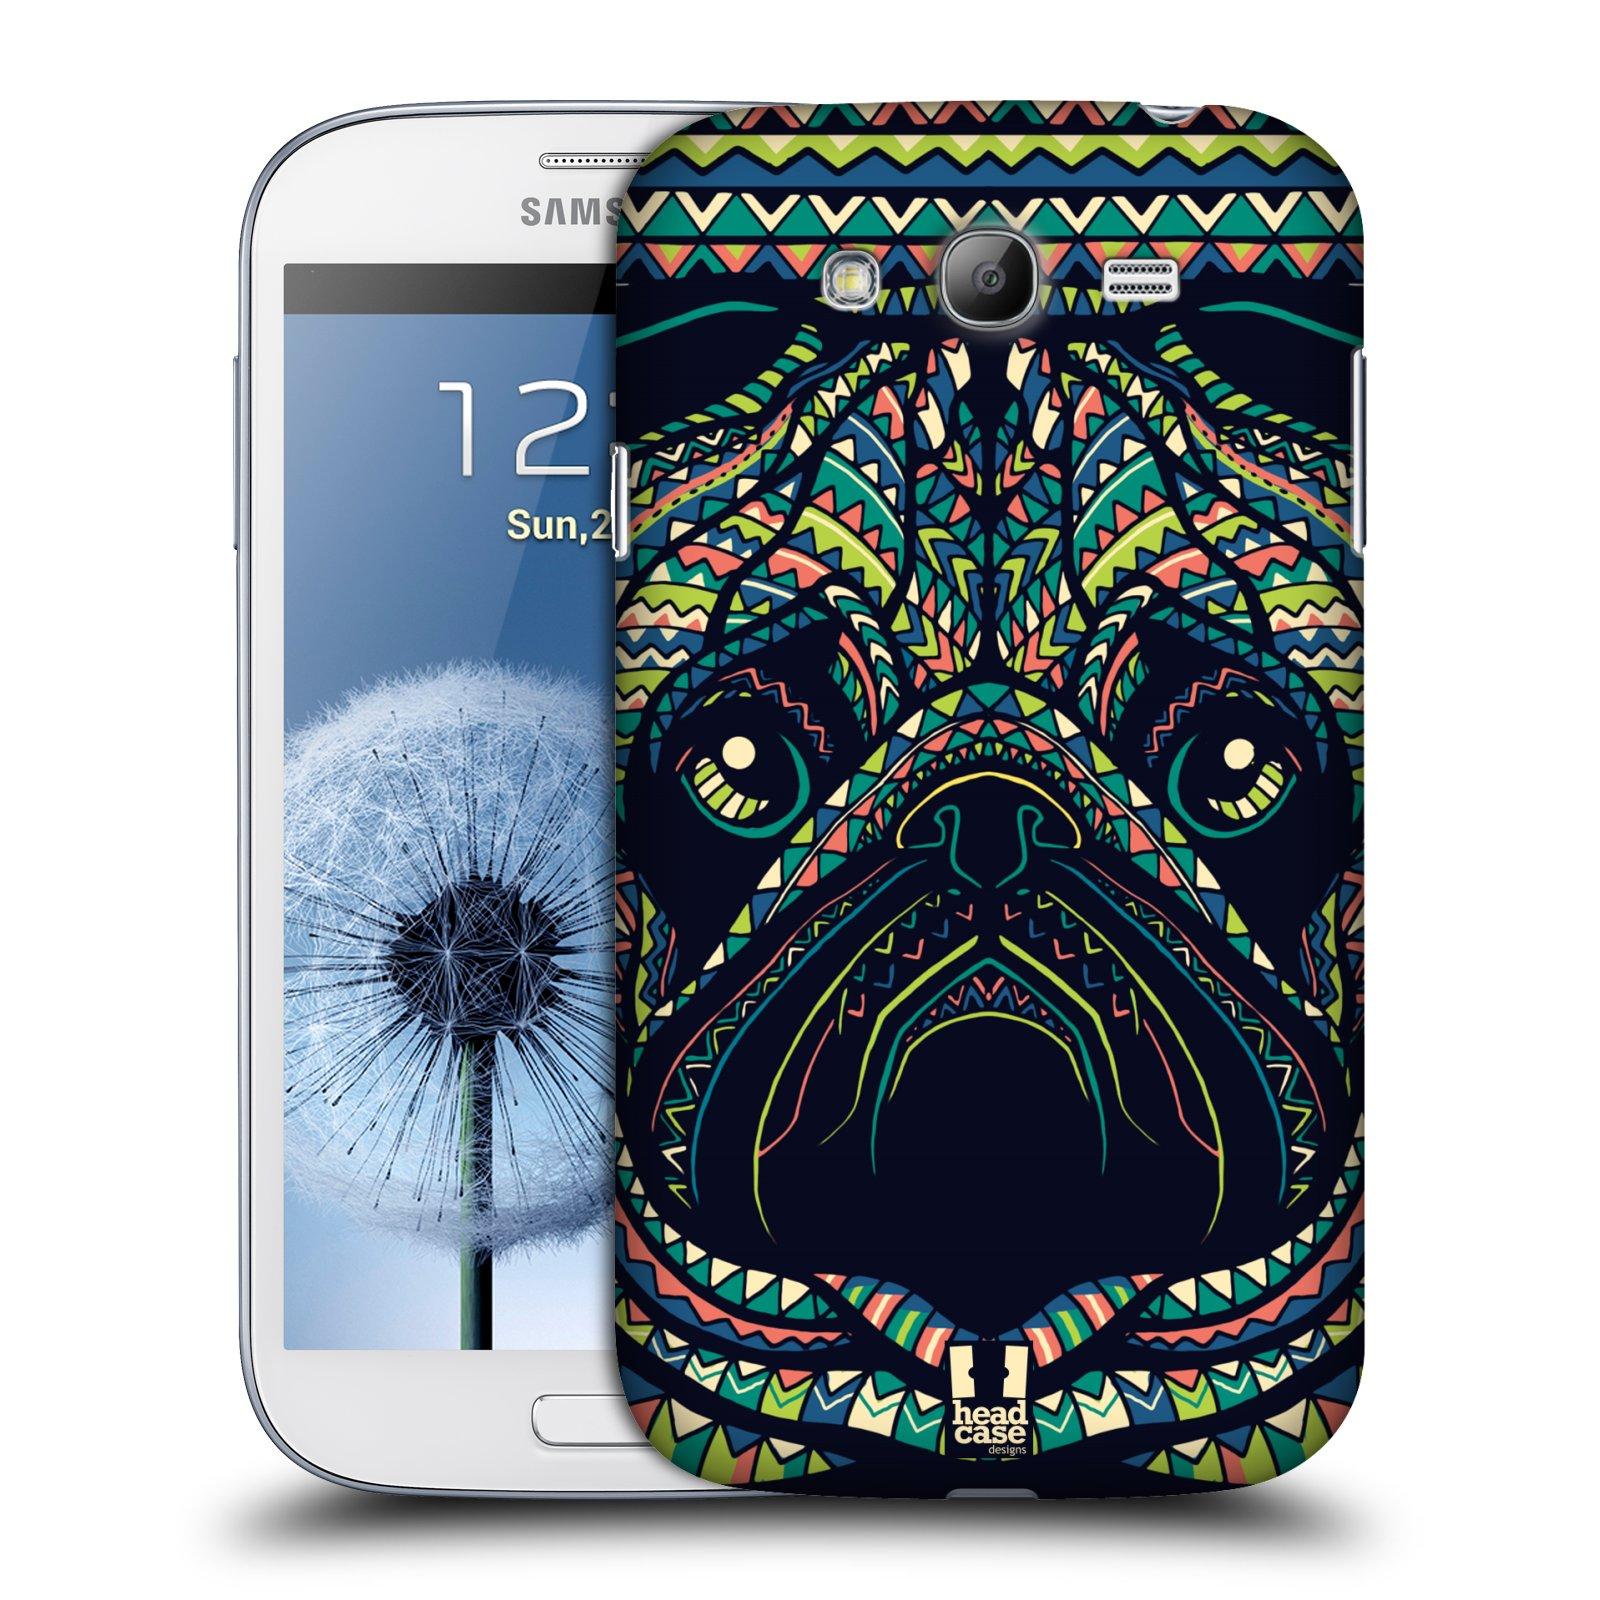 HEAD CASE plastový obal na mobil SAMSUNG GALAXY Grand i9080 vzor Aztécký motiv zvíře 3 mopsík